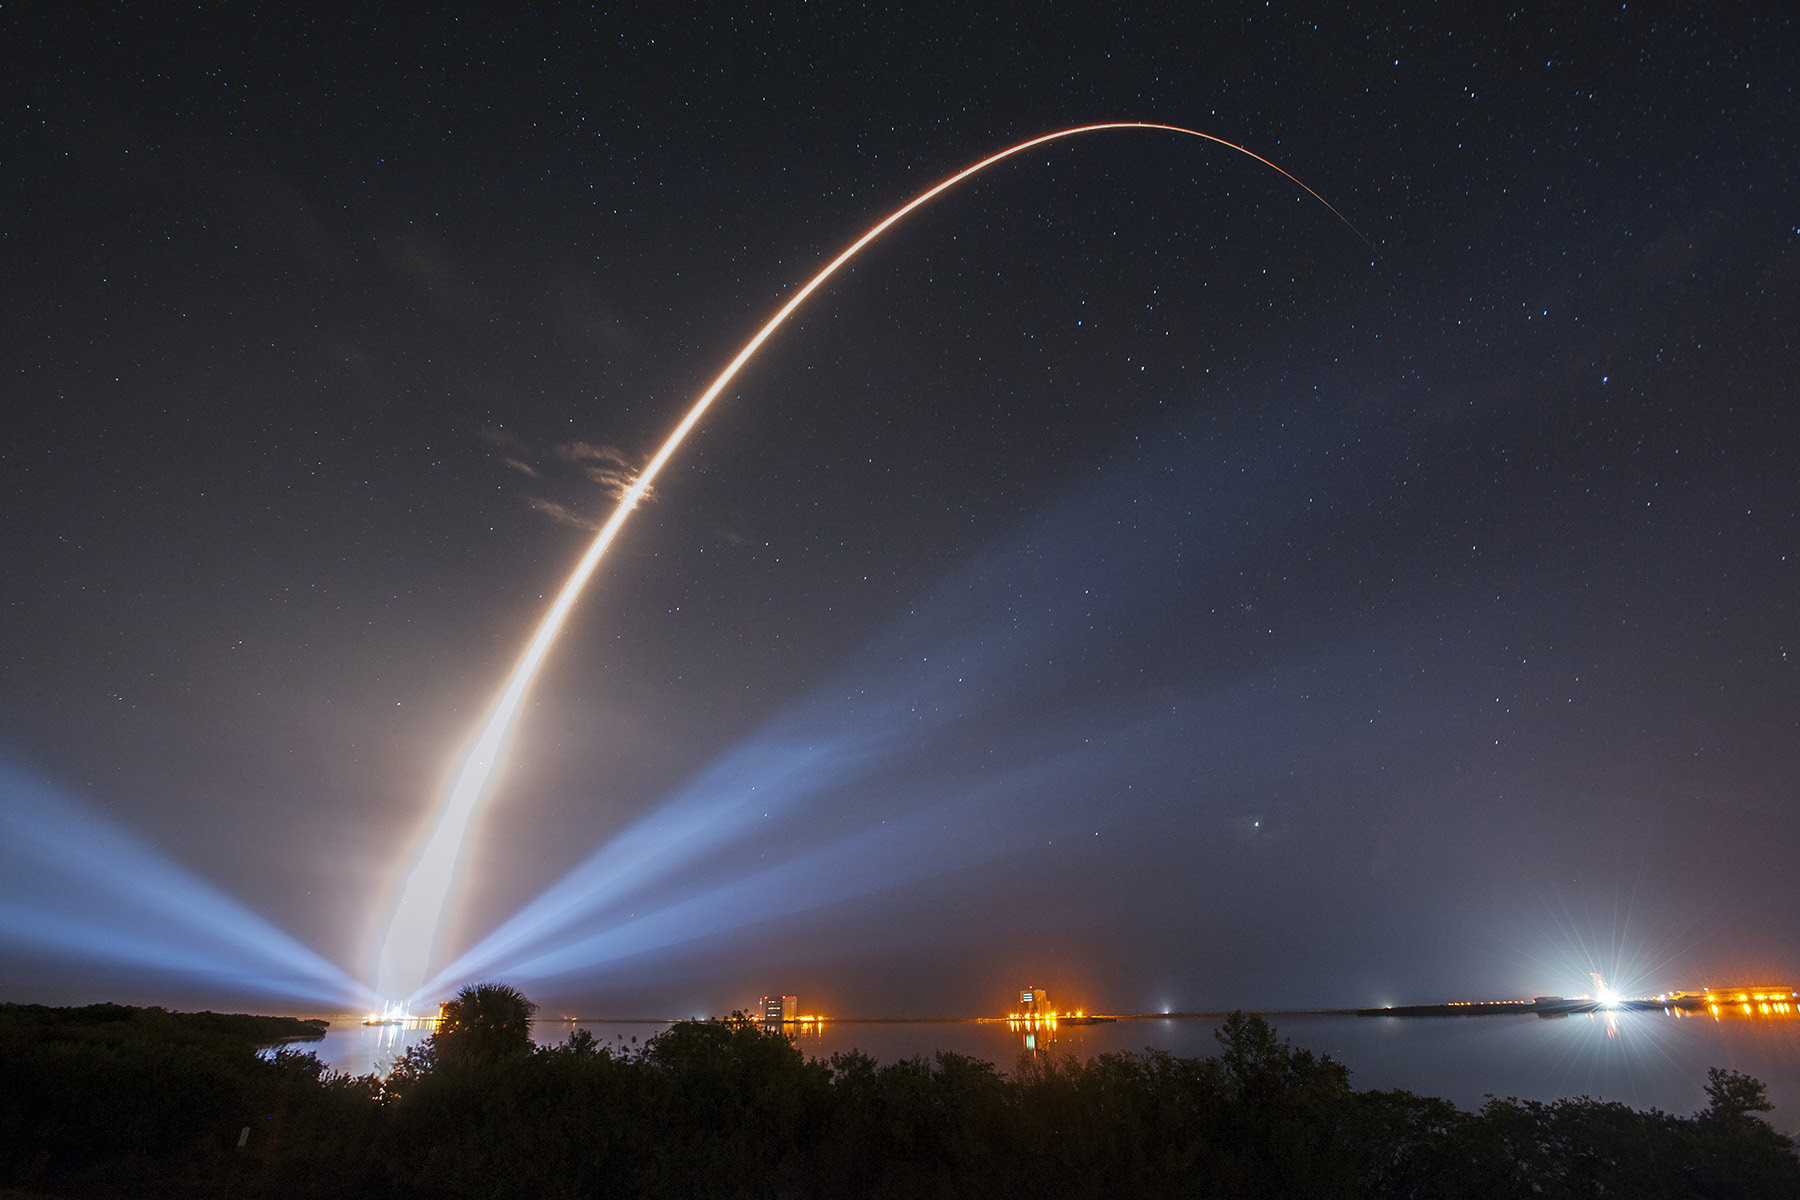 http://spacenews.com/wp-content/uploads/2015/01/av_muos3_l11.jpg